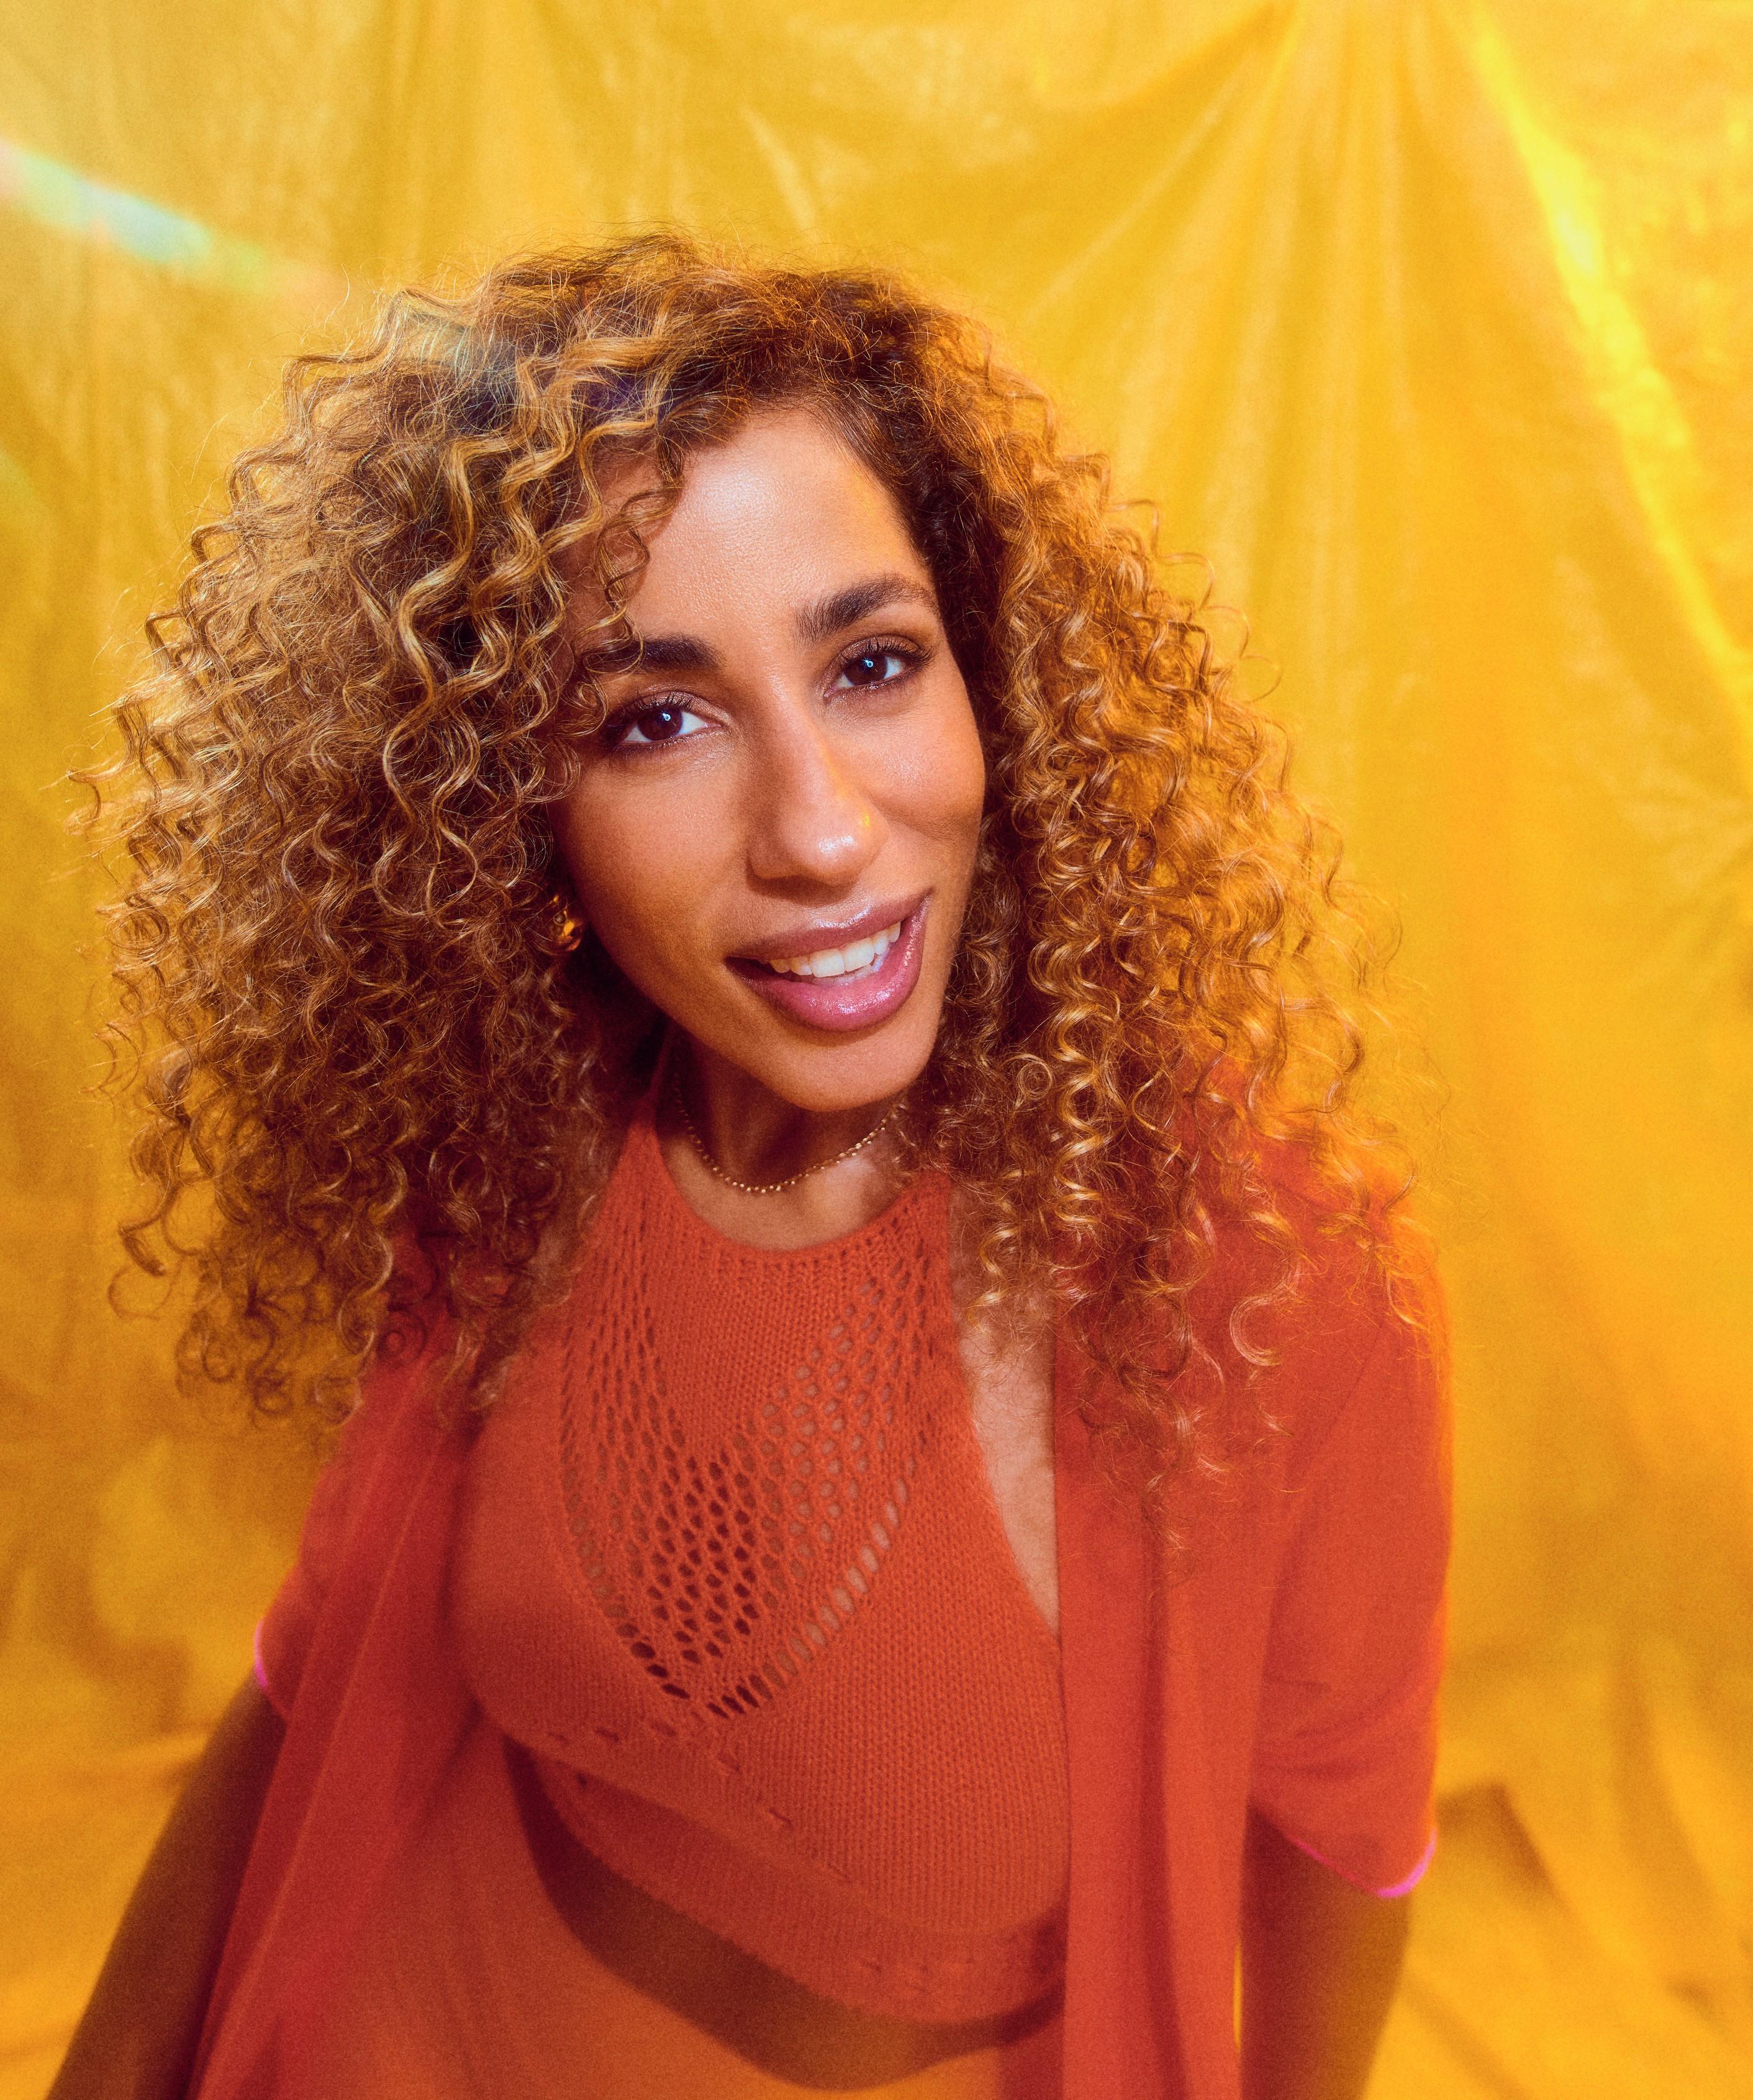 Marcia Castro irradia axé no clima solar do single 'Ver a maravilha'